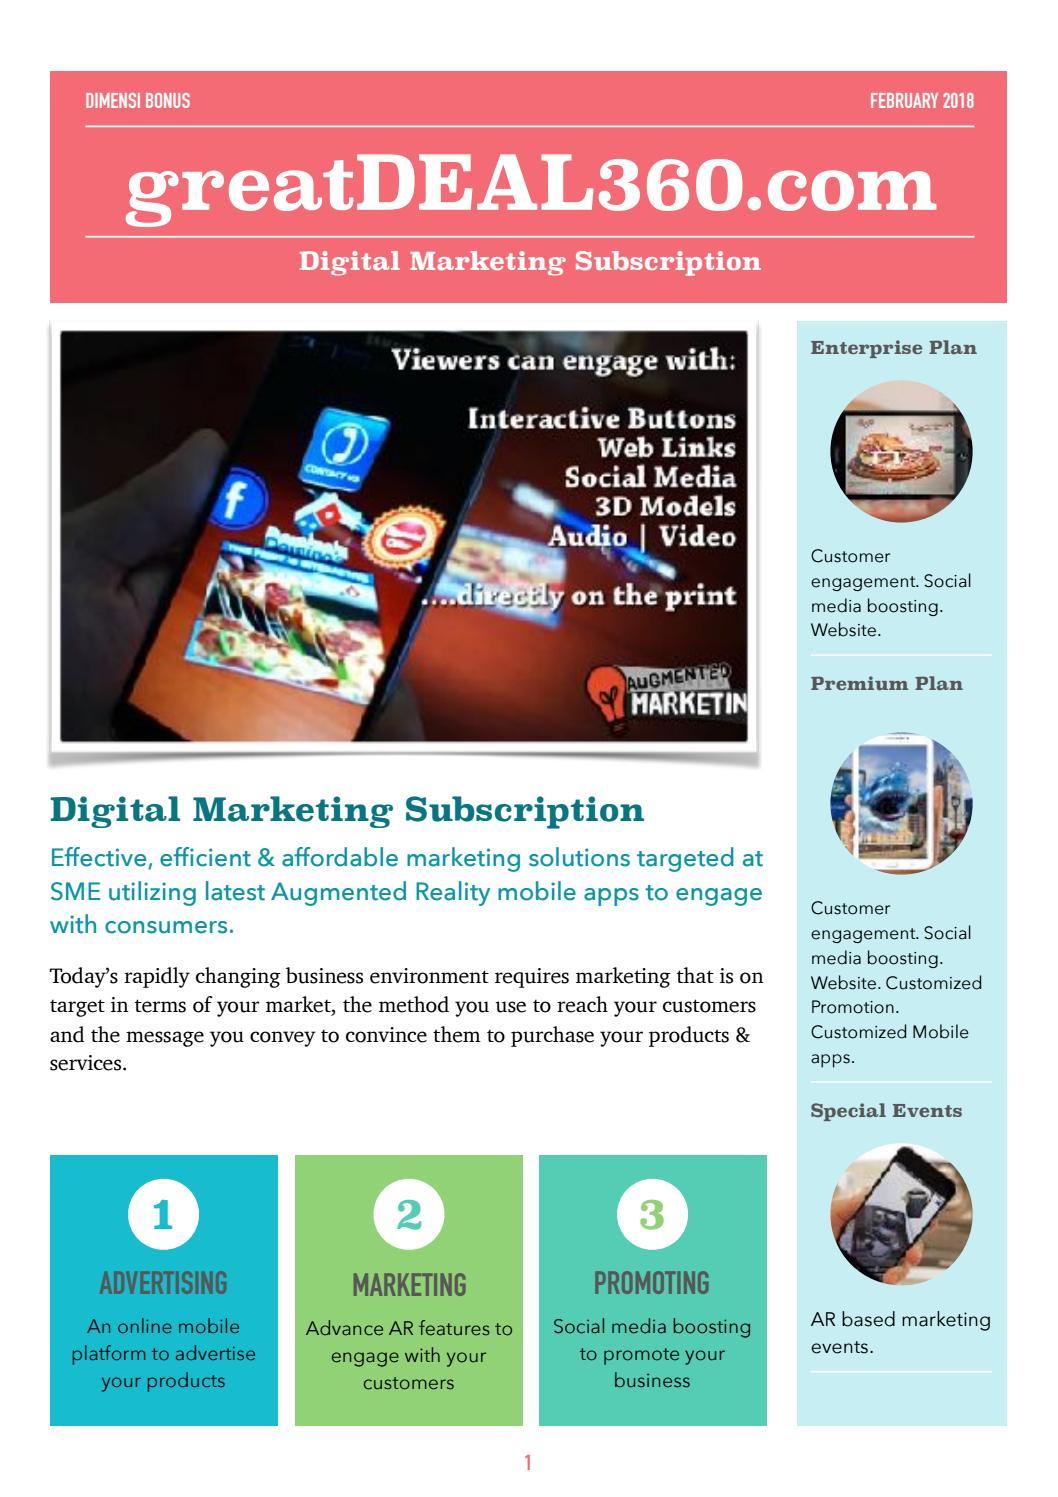 Gd360 marketing brochure by me9440 - issuu